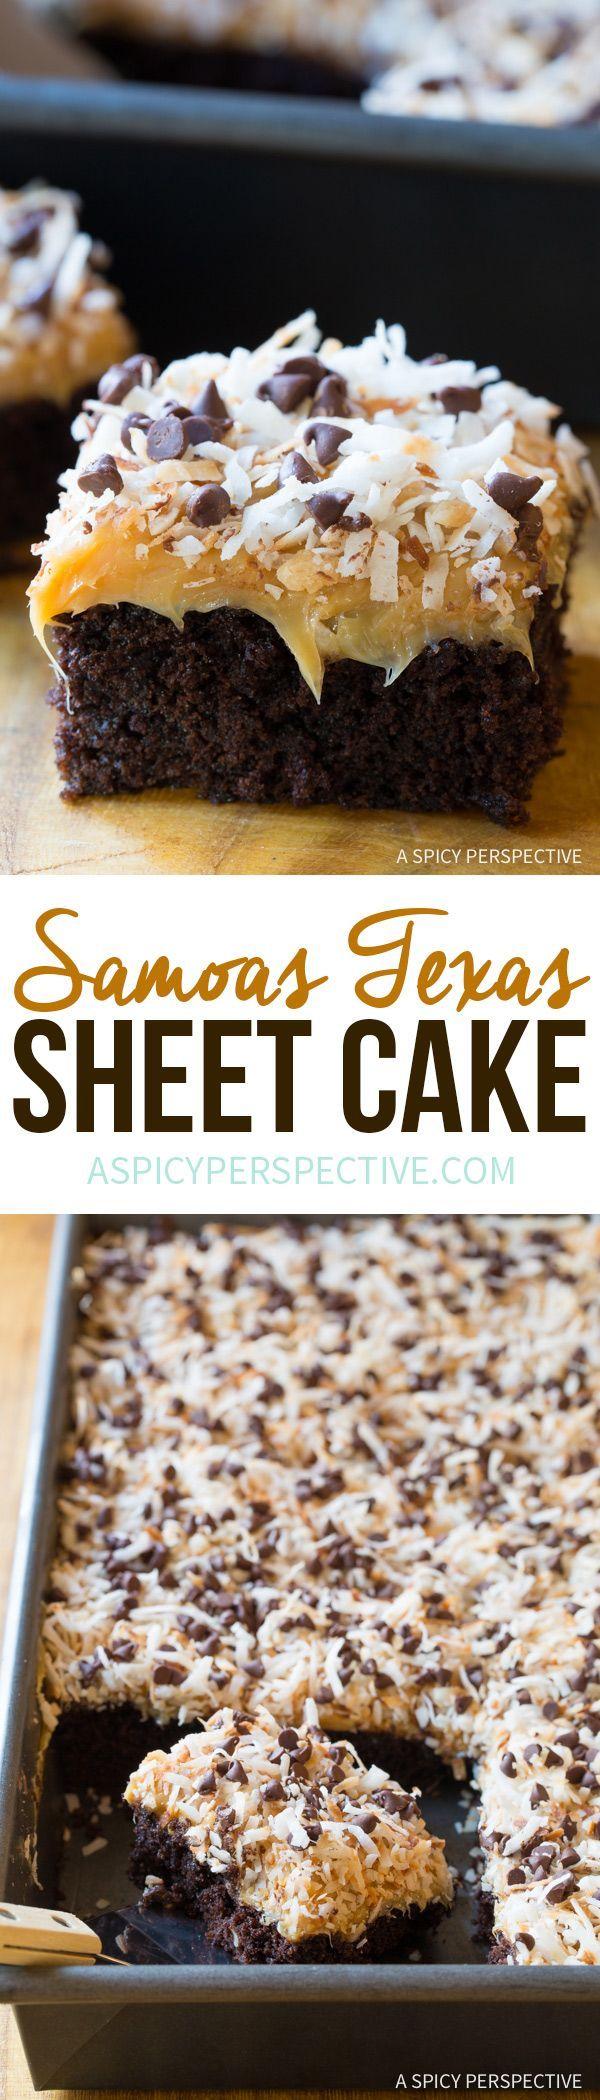 Samoas Texas Sheet Cake